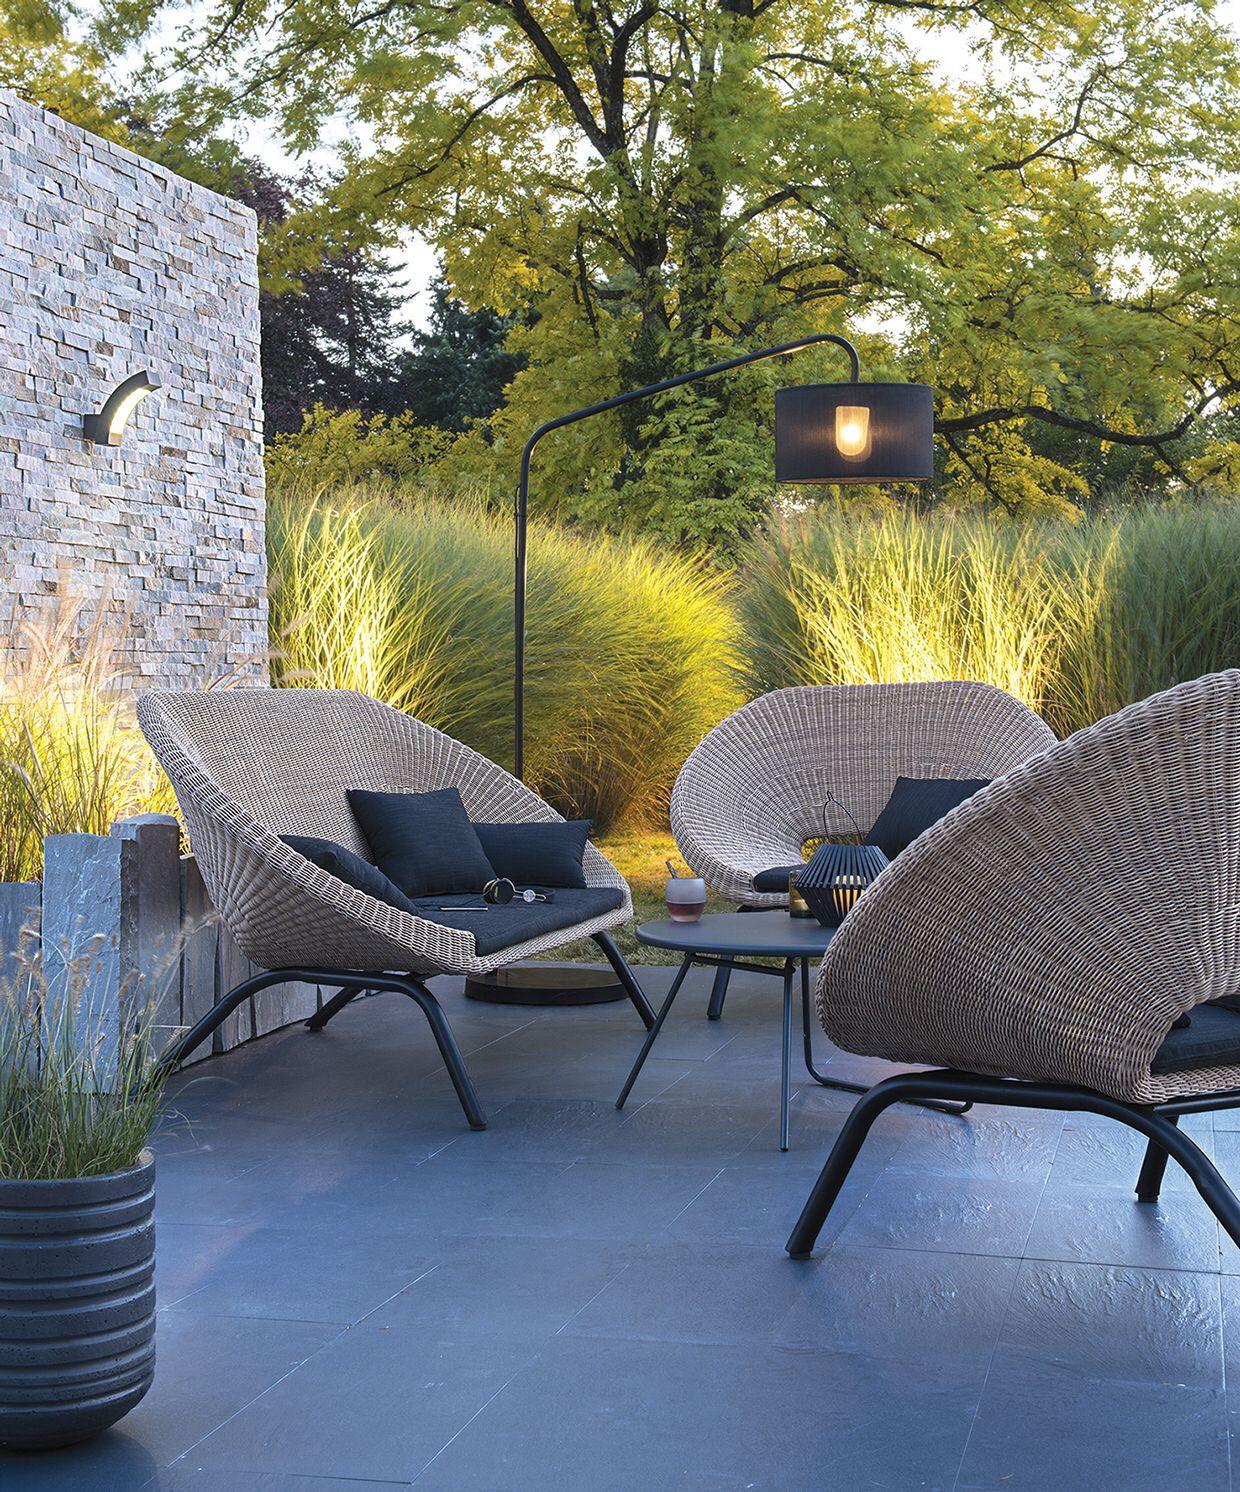 Stylish Modern Seating For The Garden ... à Blooma Salon De Jardin